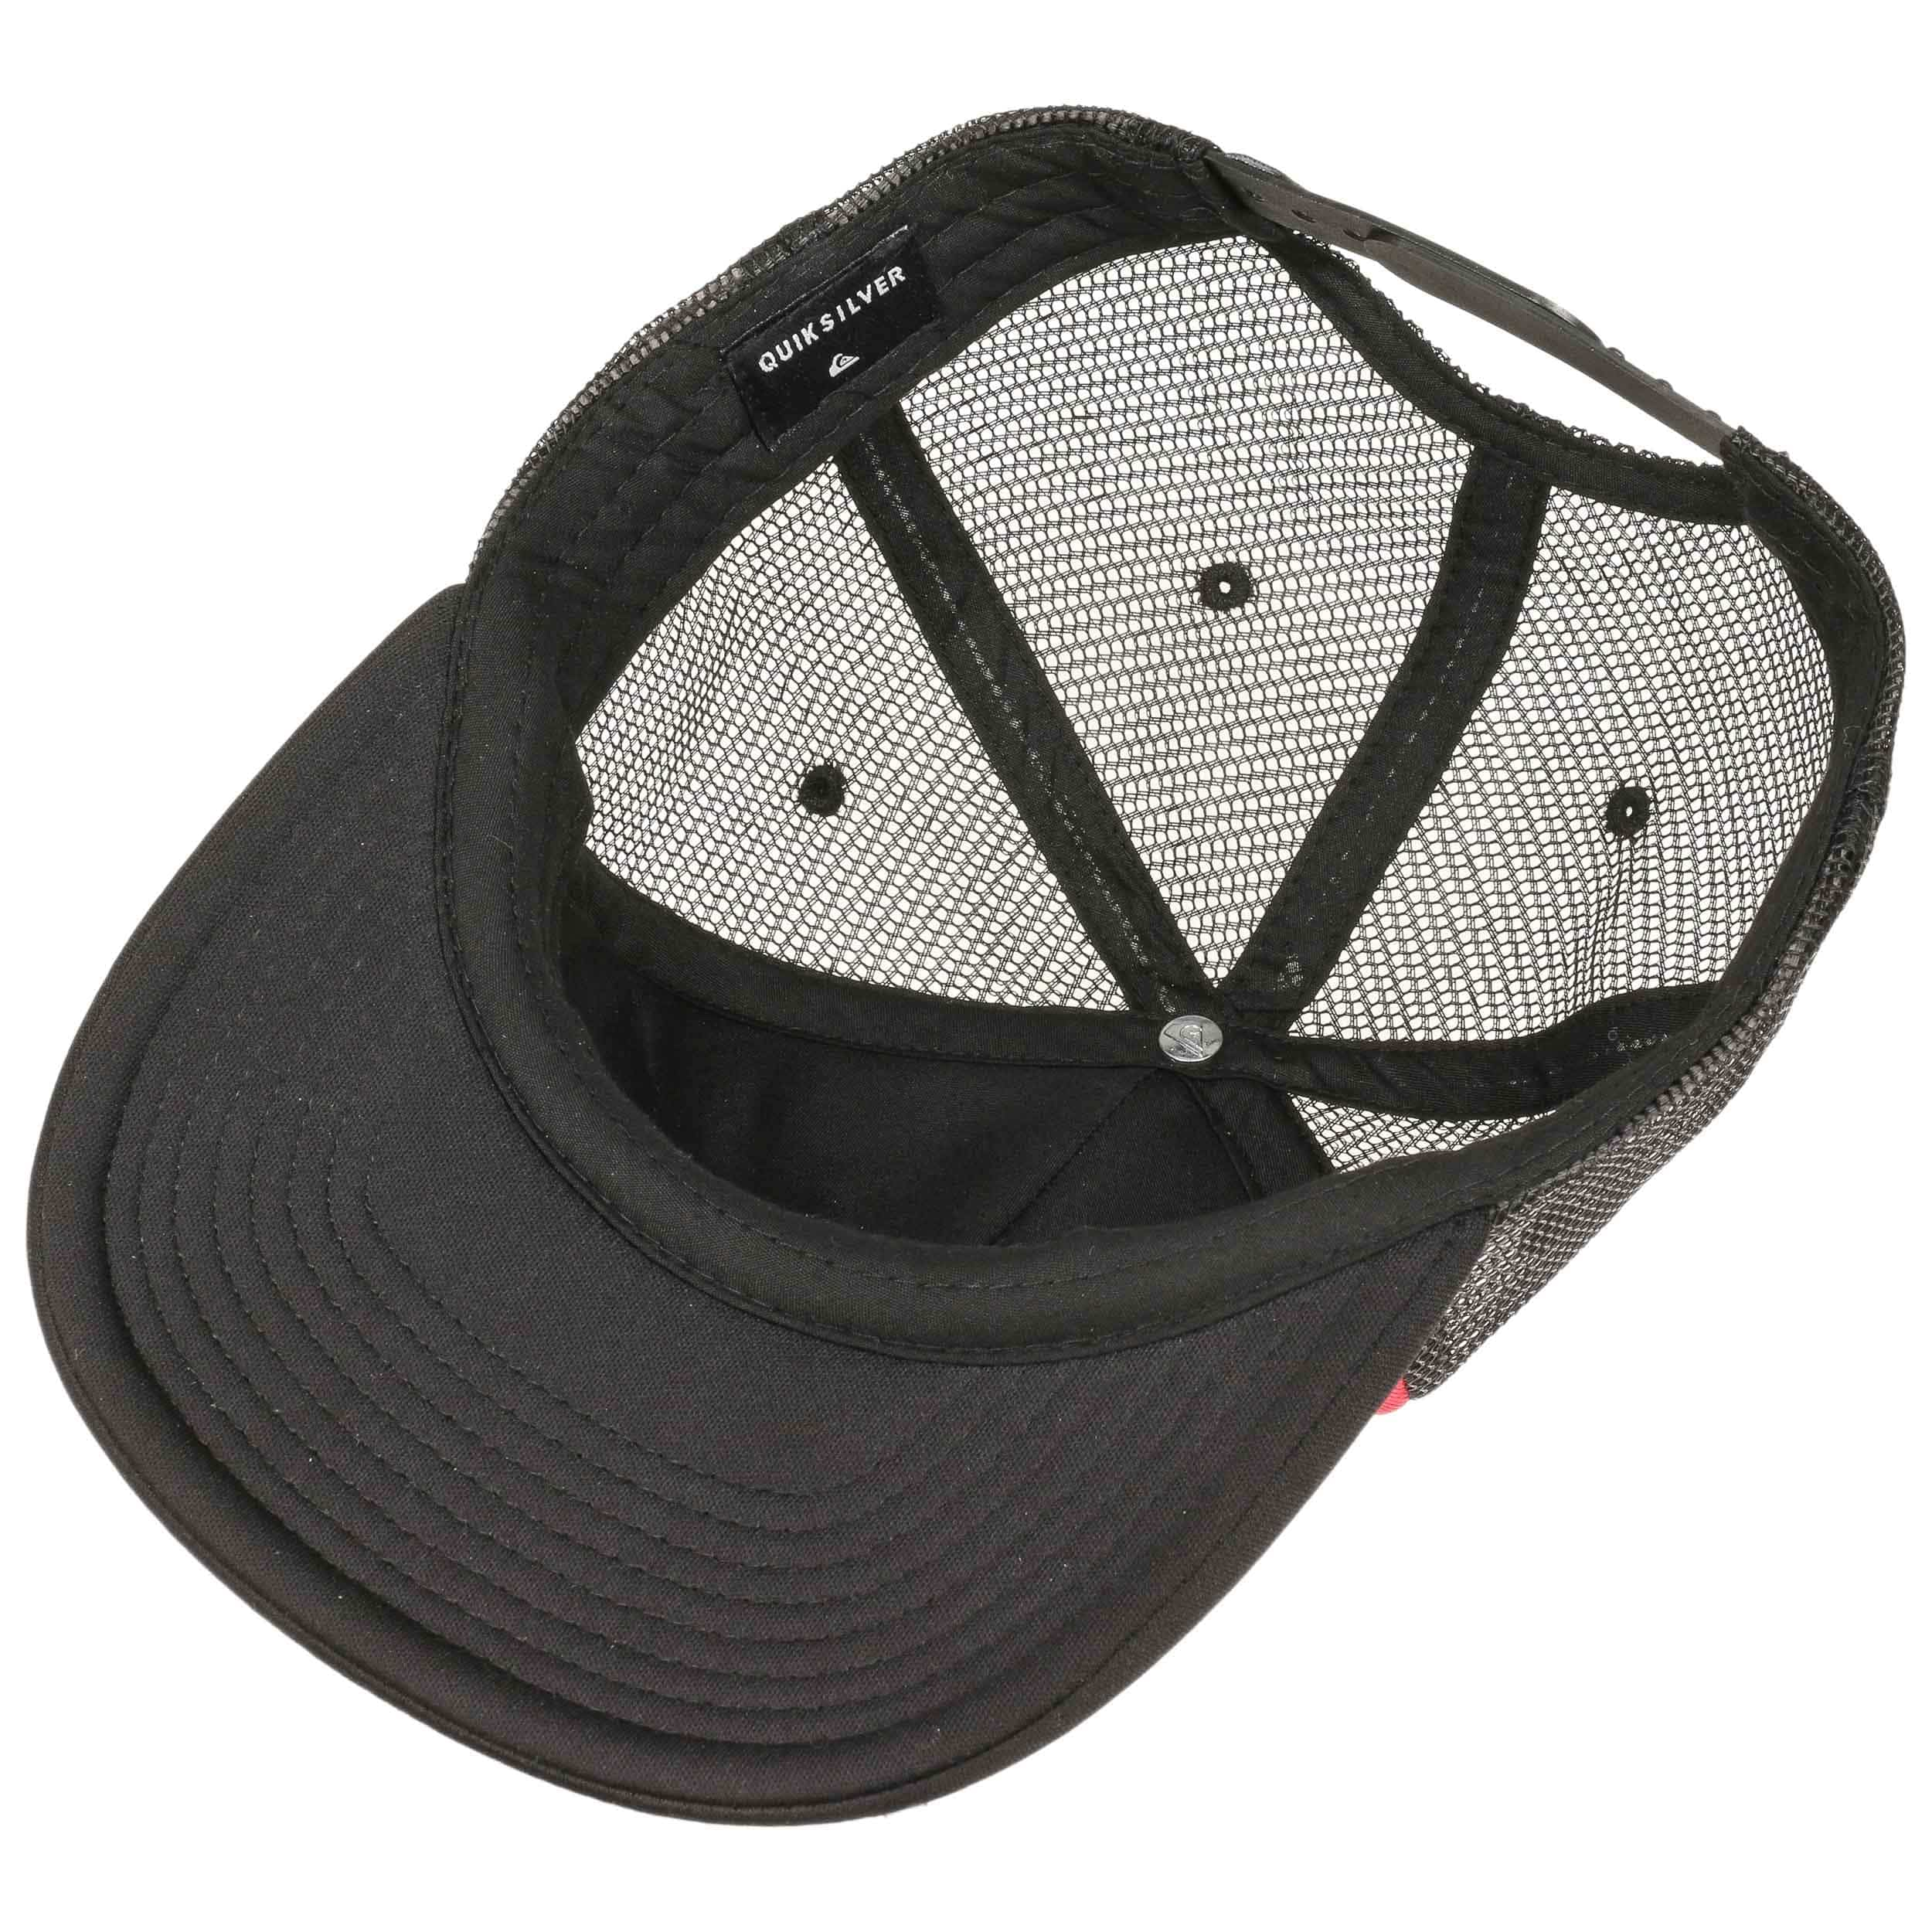 ... Snap Addict Trucker Cap by Quiksilver - black 2 ... e187d865931